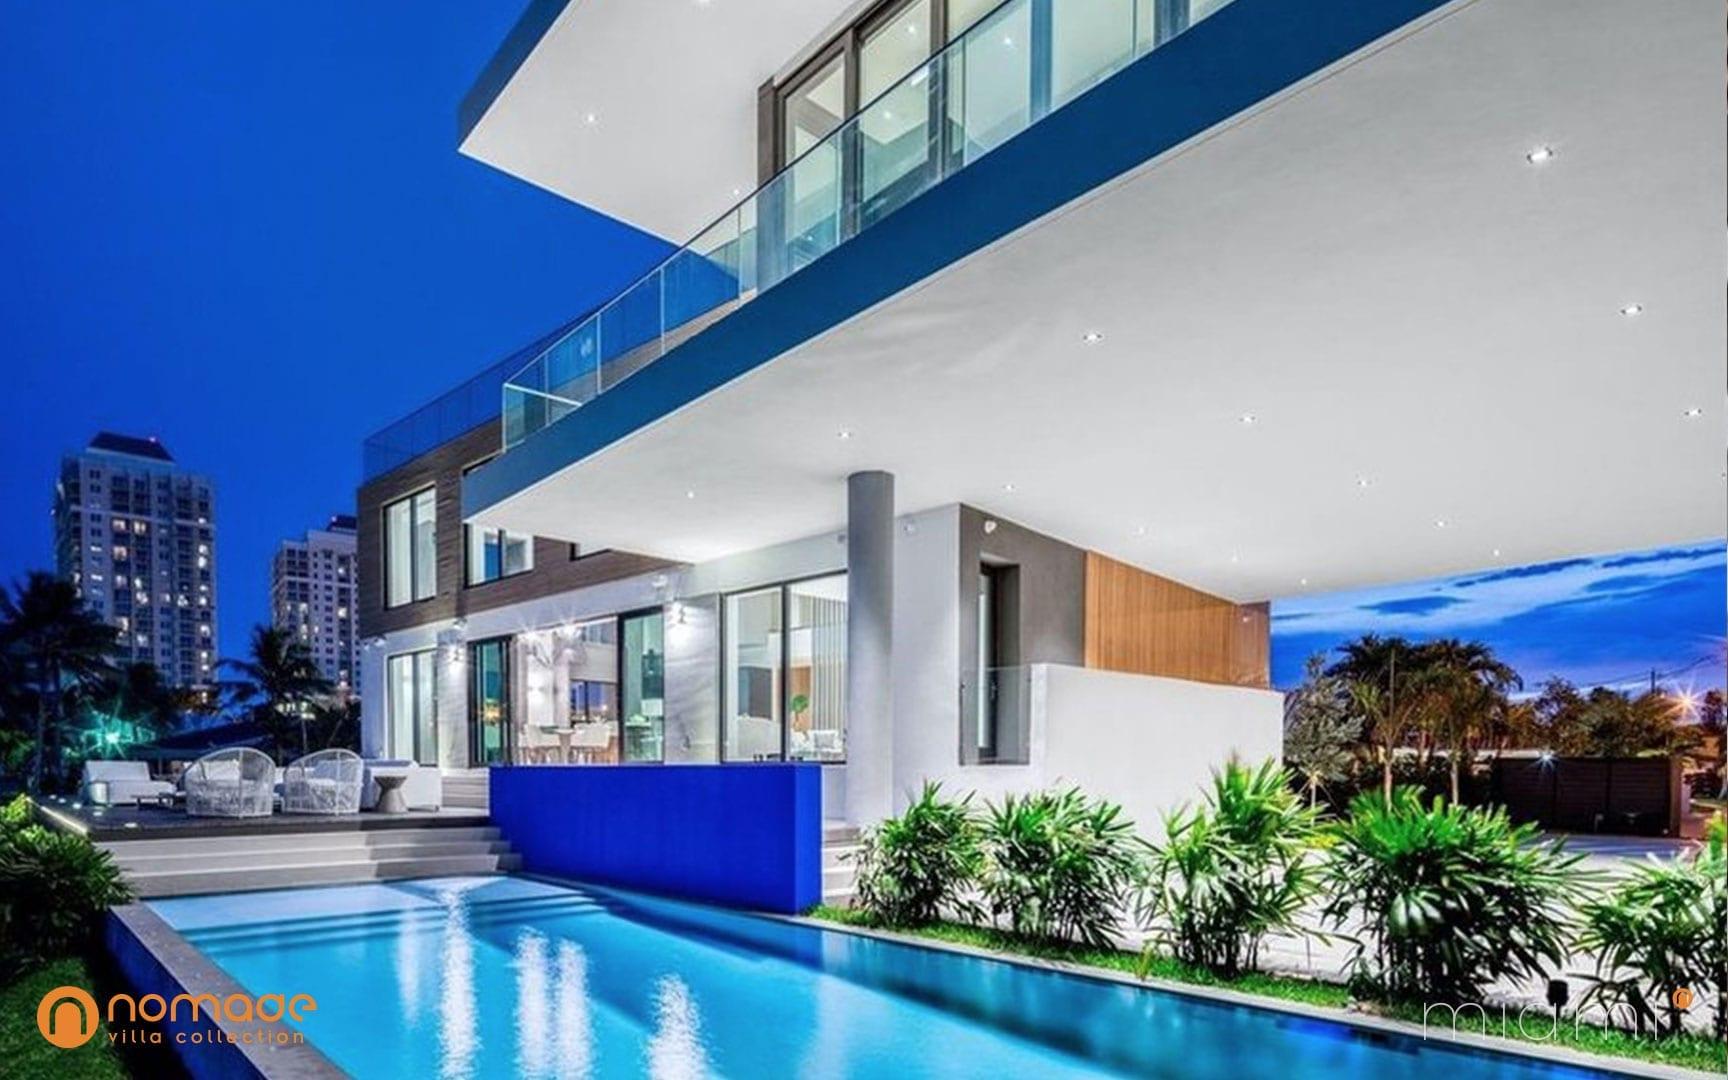 Villa Oceana - Miami Villa Rental - Nomade Villa Collection